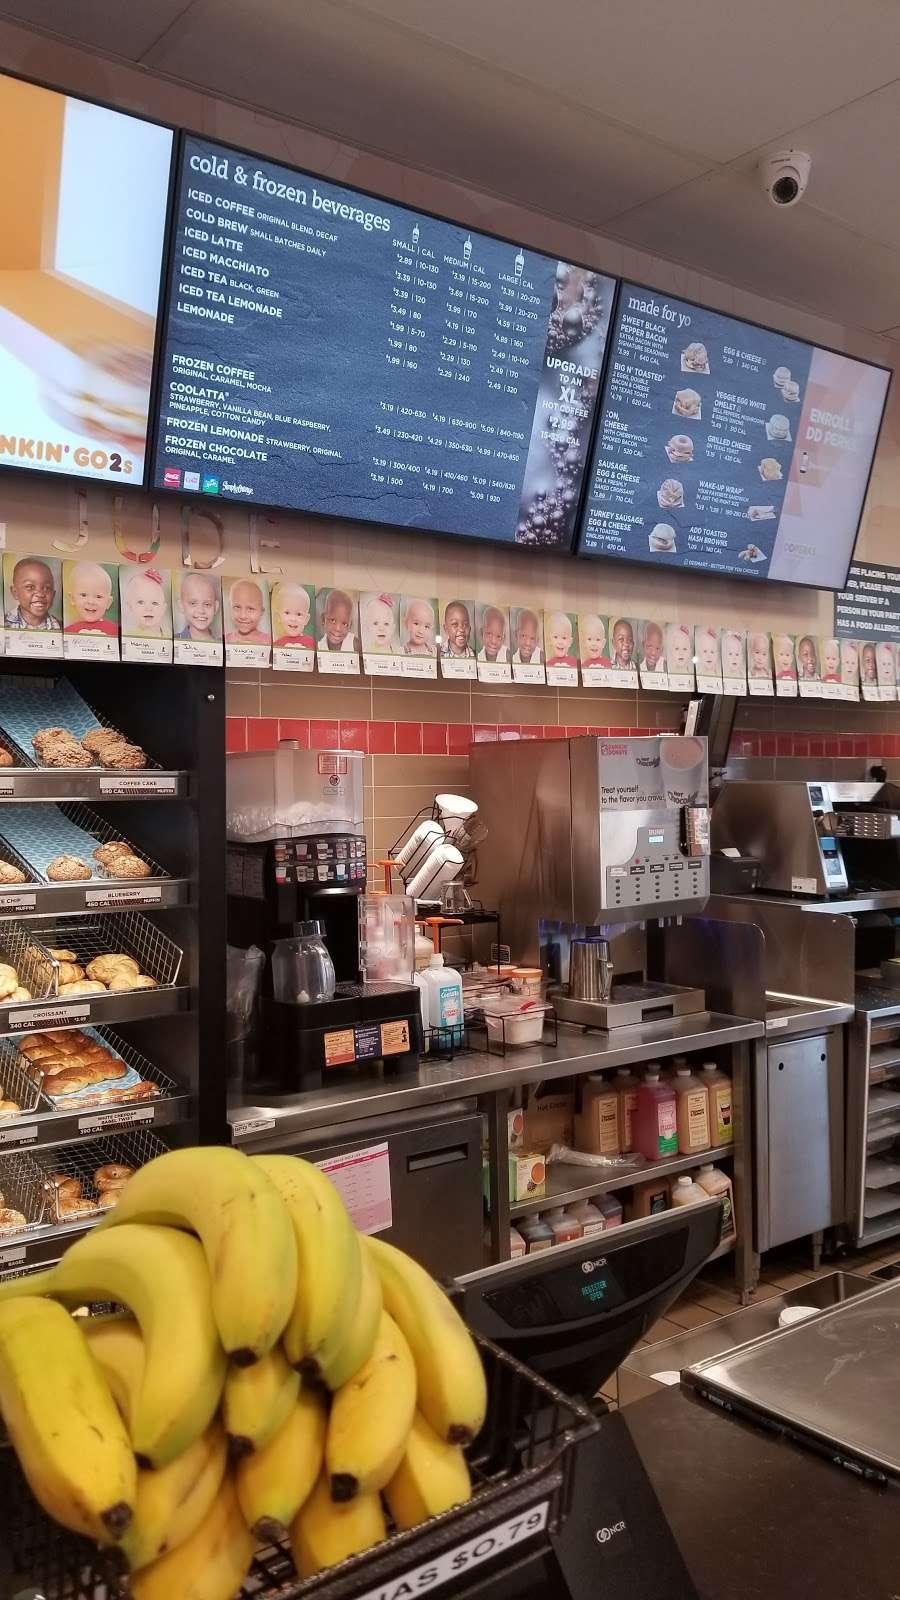 Dunkin Donuts - cafe  | Photo 3 of 10 | Address: 34-21 Greenpoint Ave, Long Island City, NY 11101, USA | Phone: (718) 937-7770